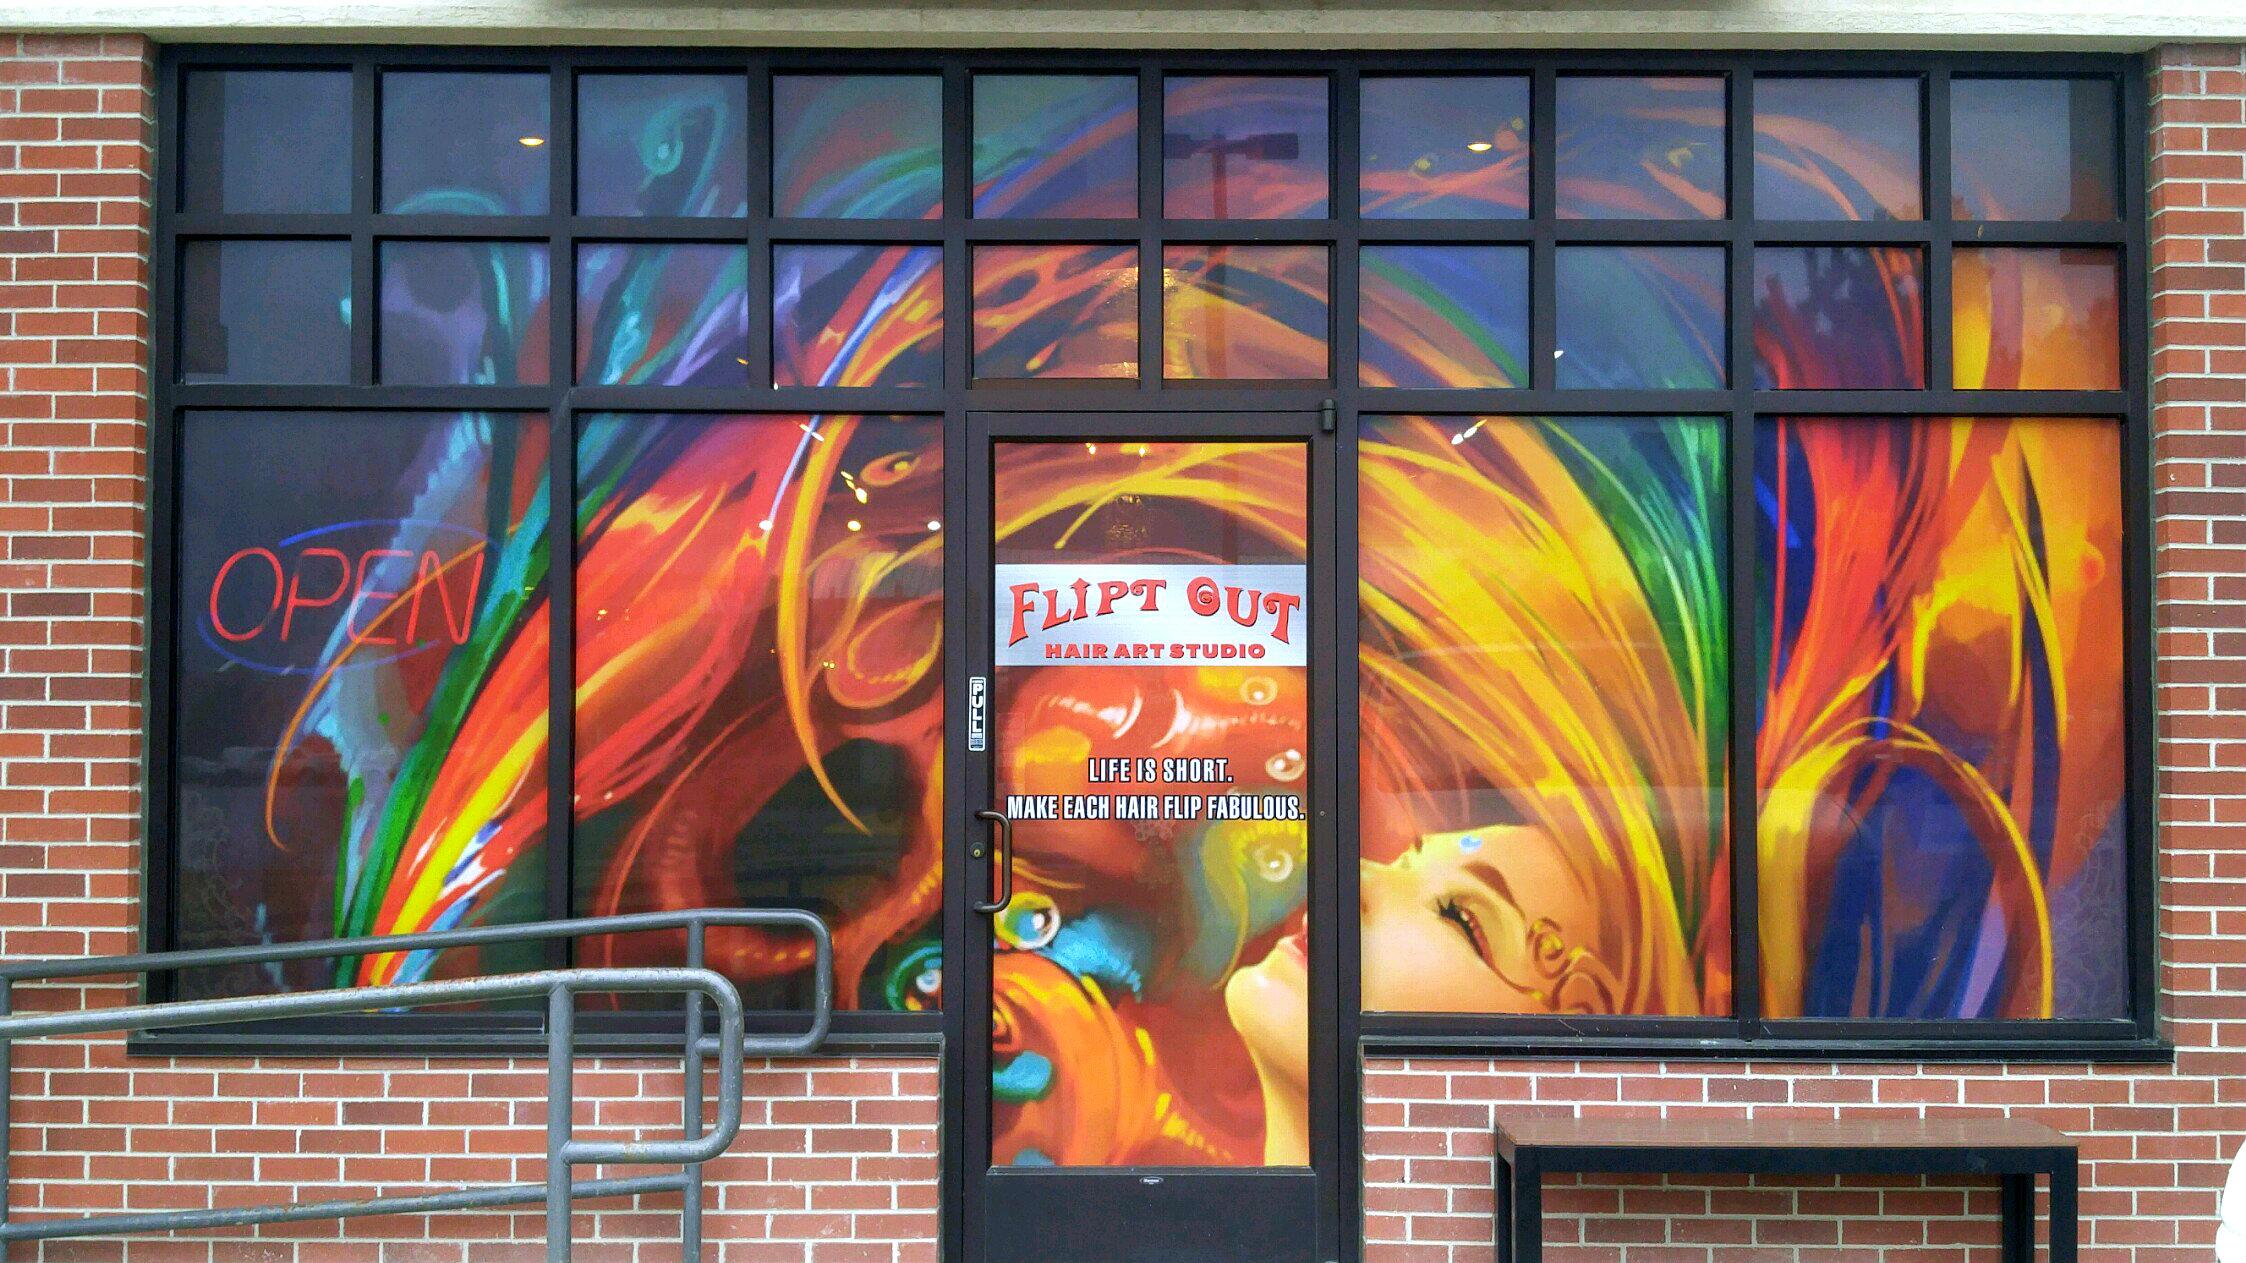 FLIPTOUT WINDOWS - Copy